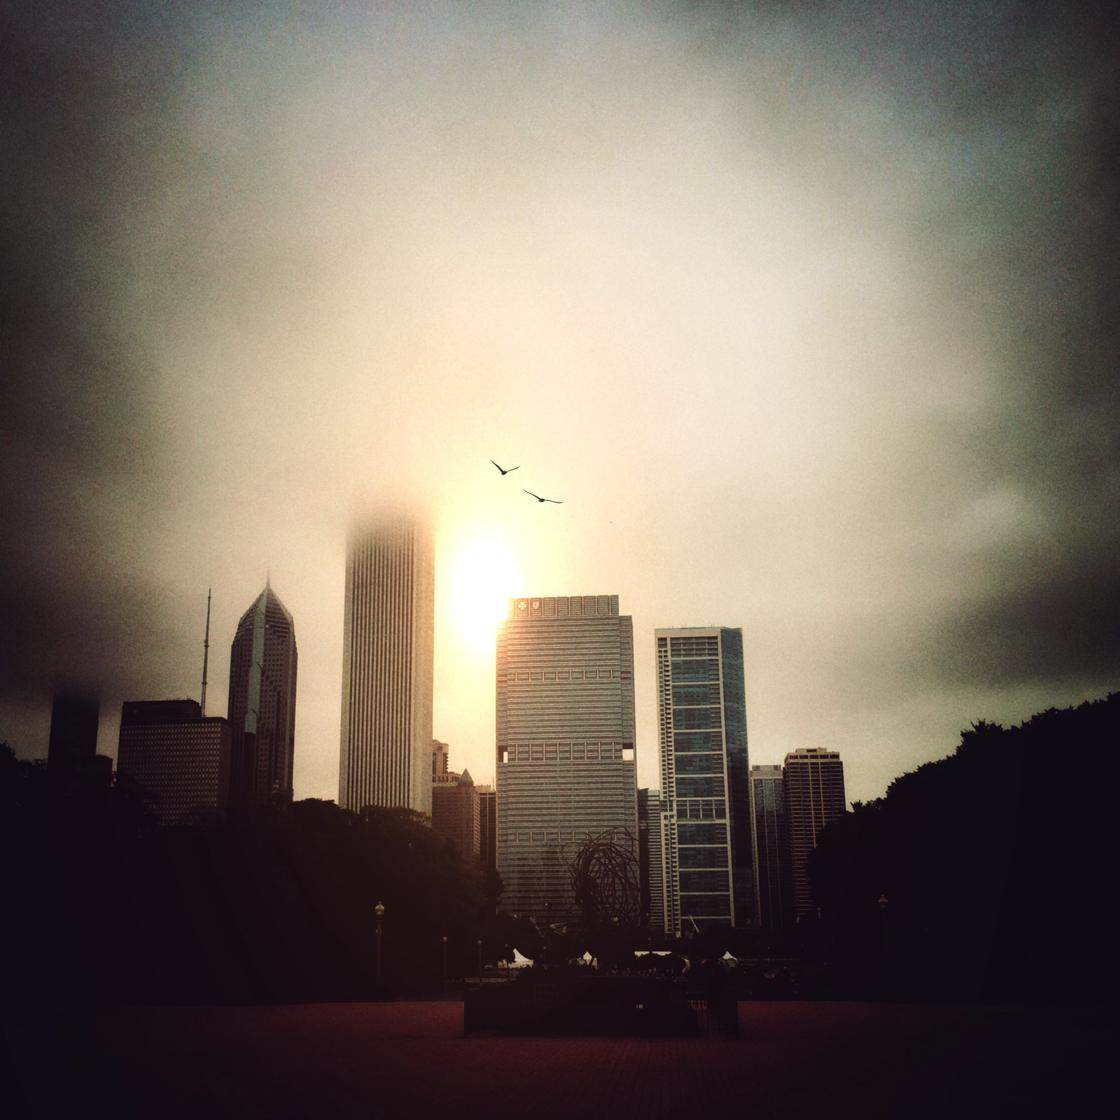 urban iPhone photo contest-06 no script